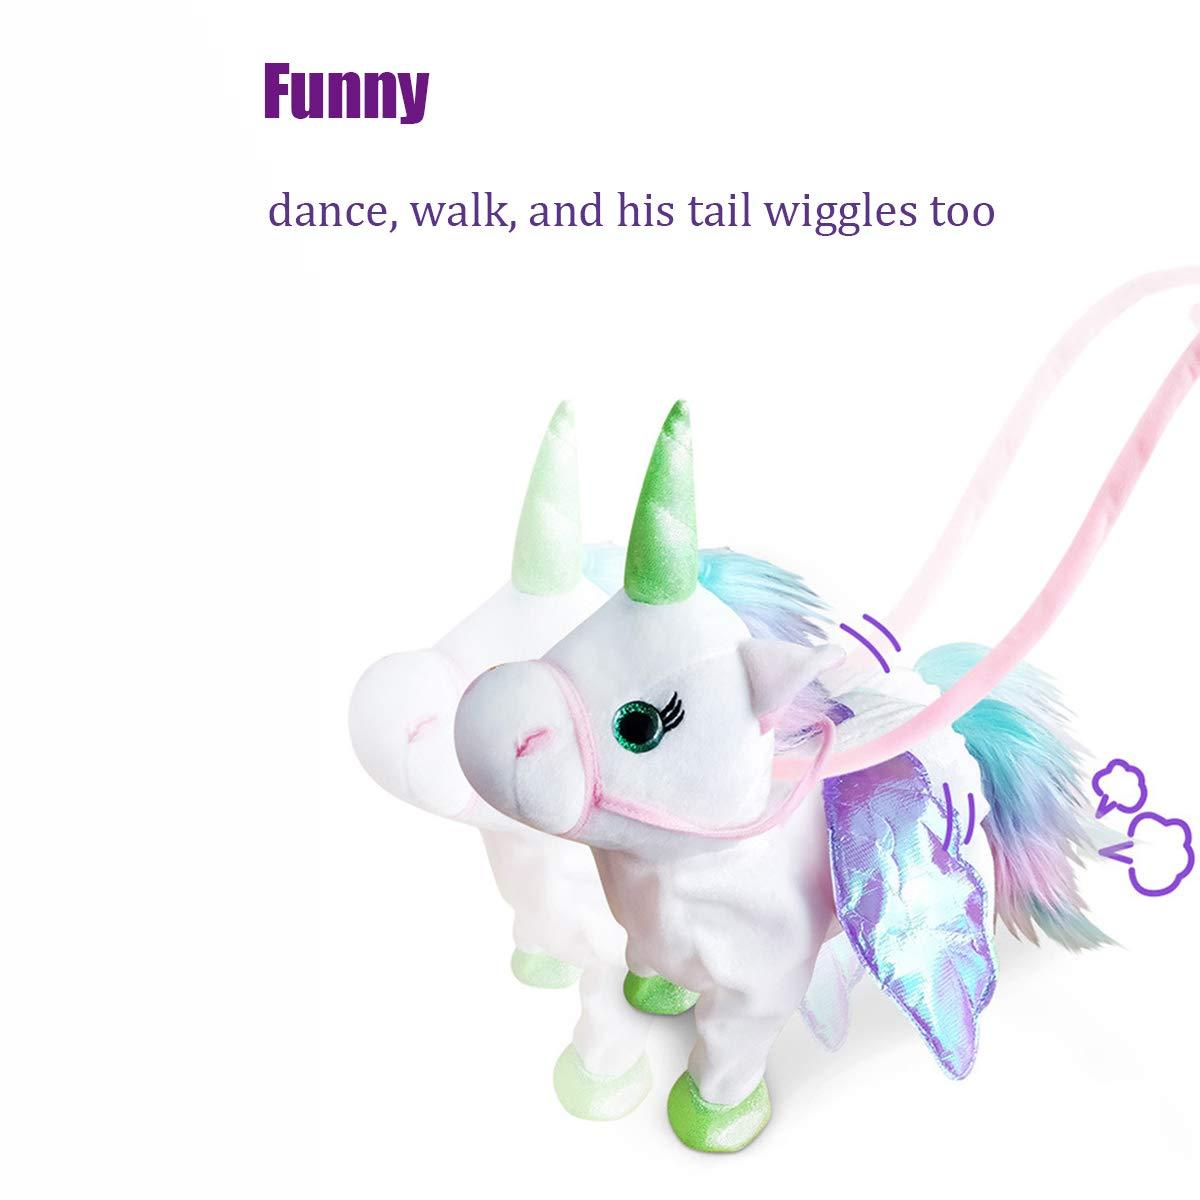 qiaoniuniu Electronic Pet Unicorn - Pink Small Pegasus - Stuffed Unicorn ,Singing Walking Musical Cute Plush Toys for Toddlers Girls Boys,Kids & Pets Birthday by qiaoniuniu (Image #6)